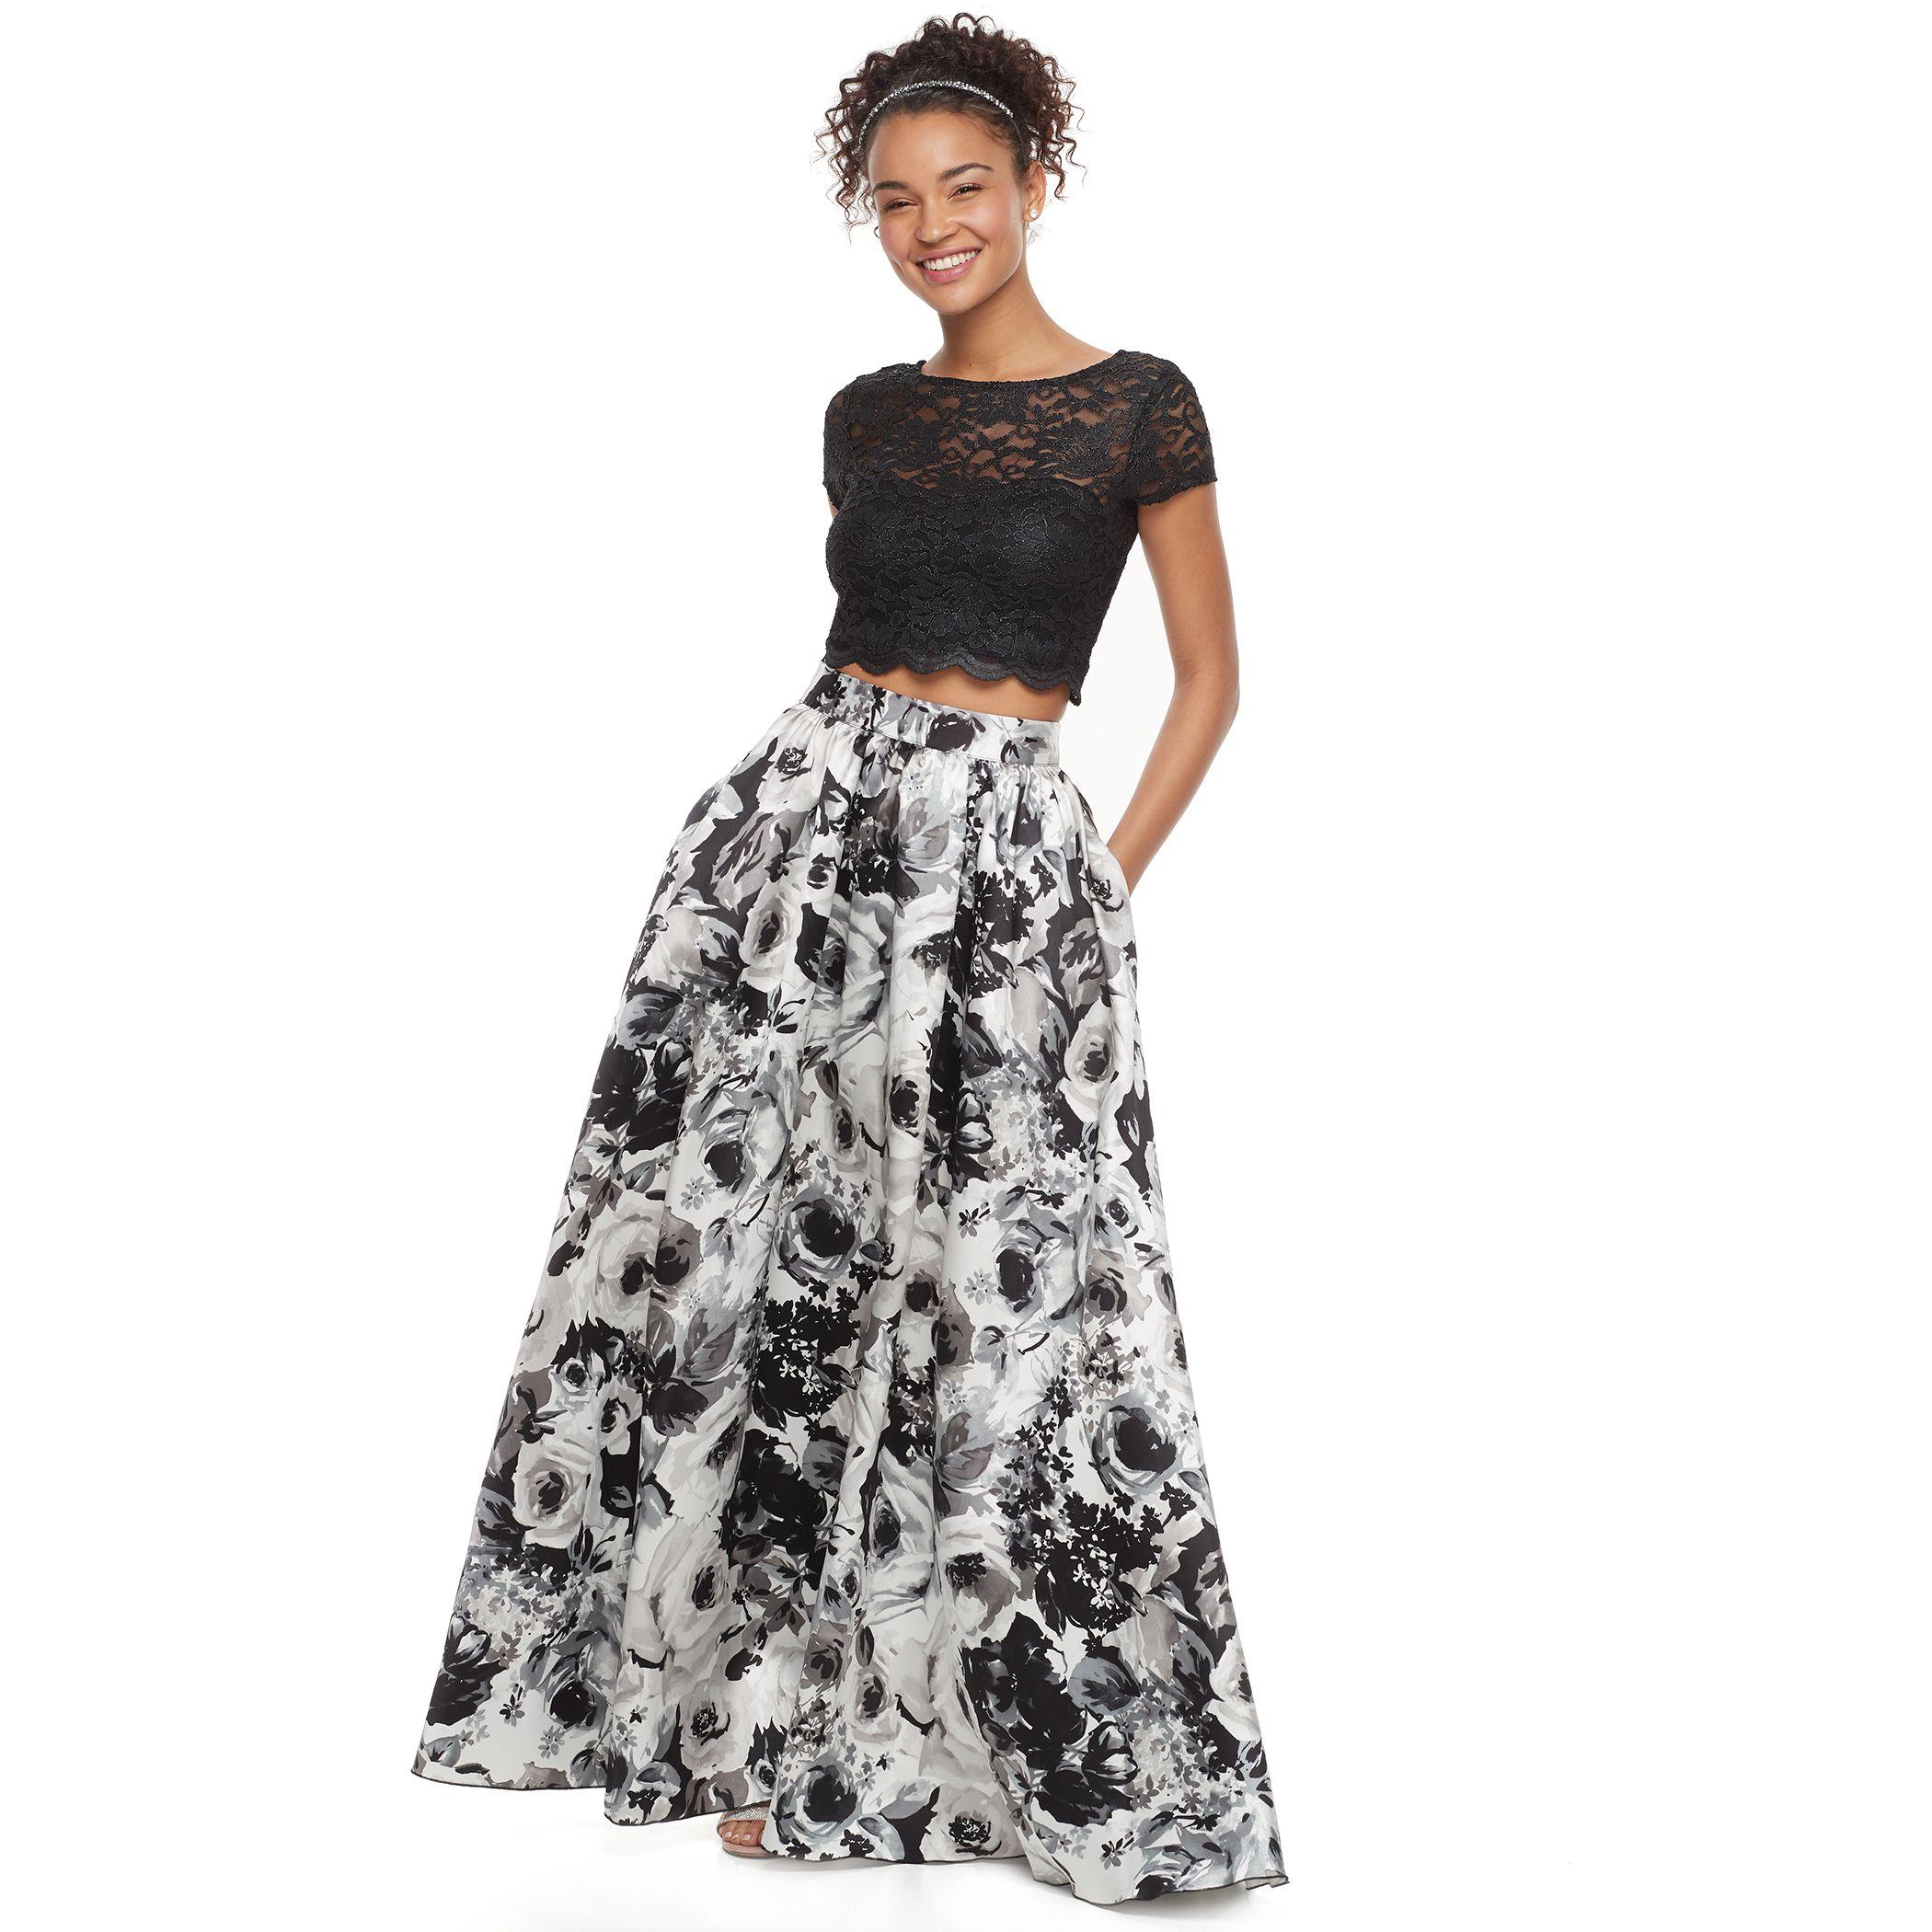 Juniors' Speechless Lace & Floral 2-Piece